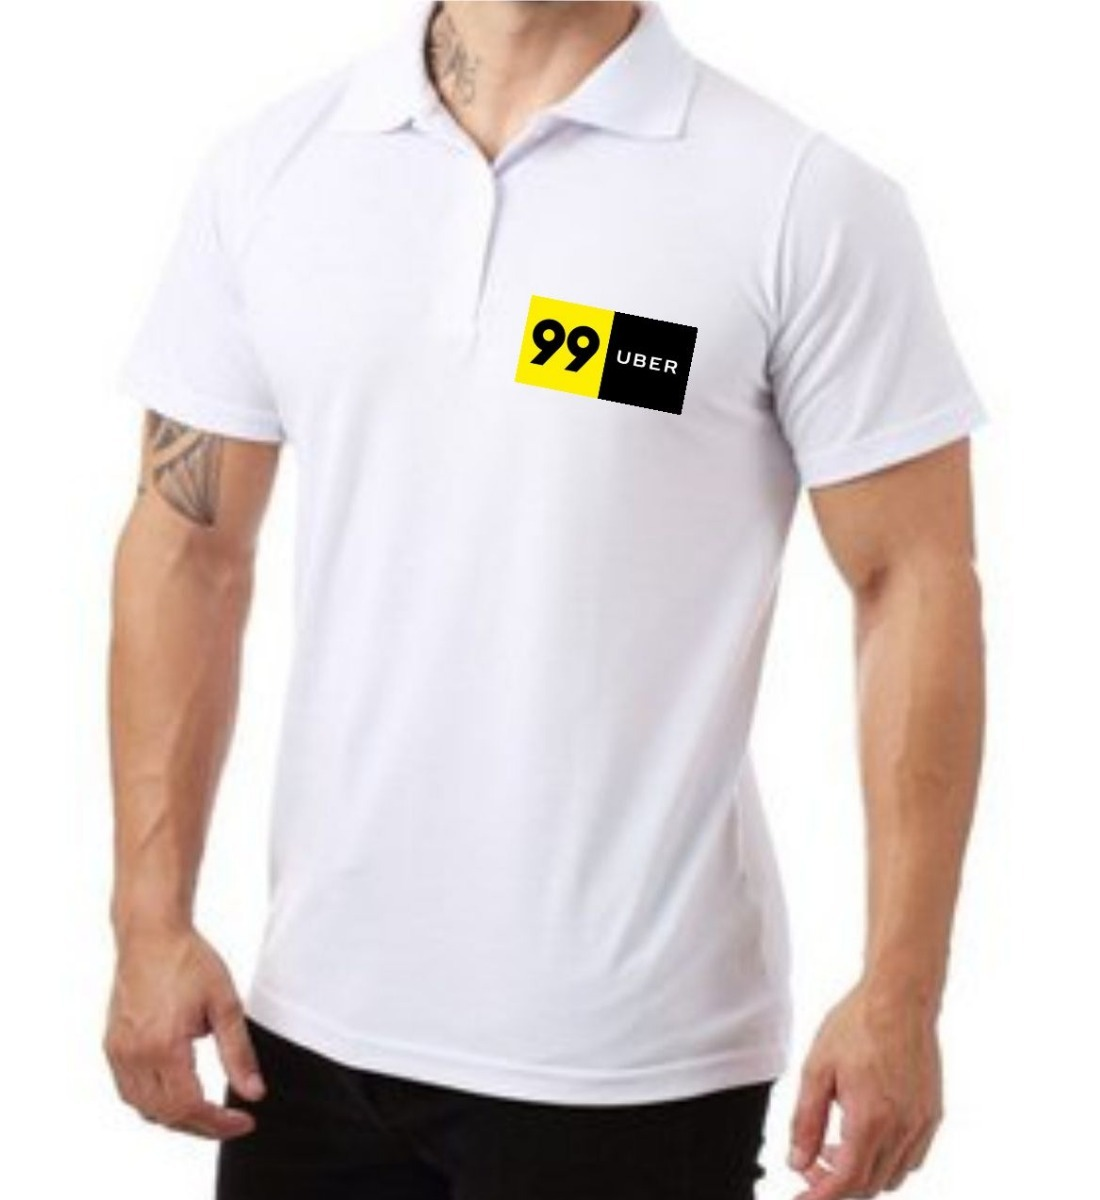 0ef31c0ac camisa polo masculina 99   uber. Carregando zoom.